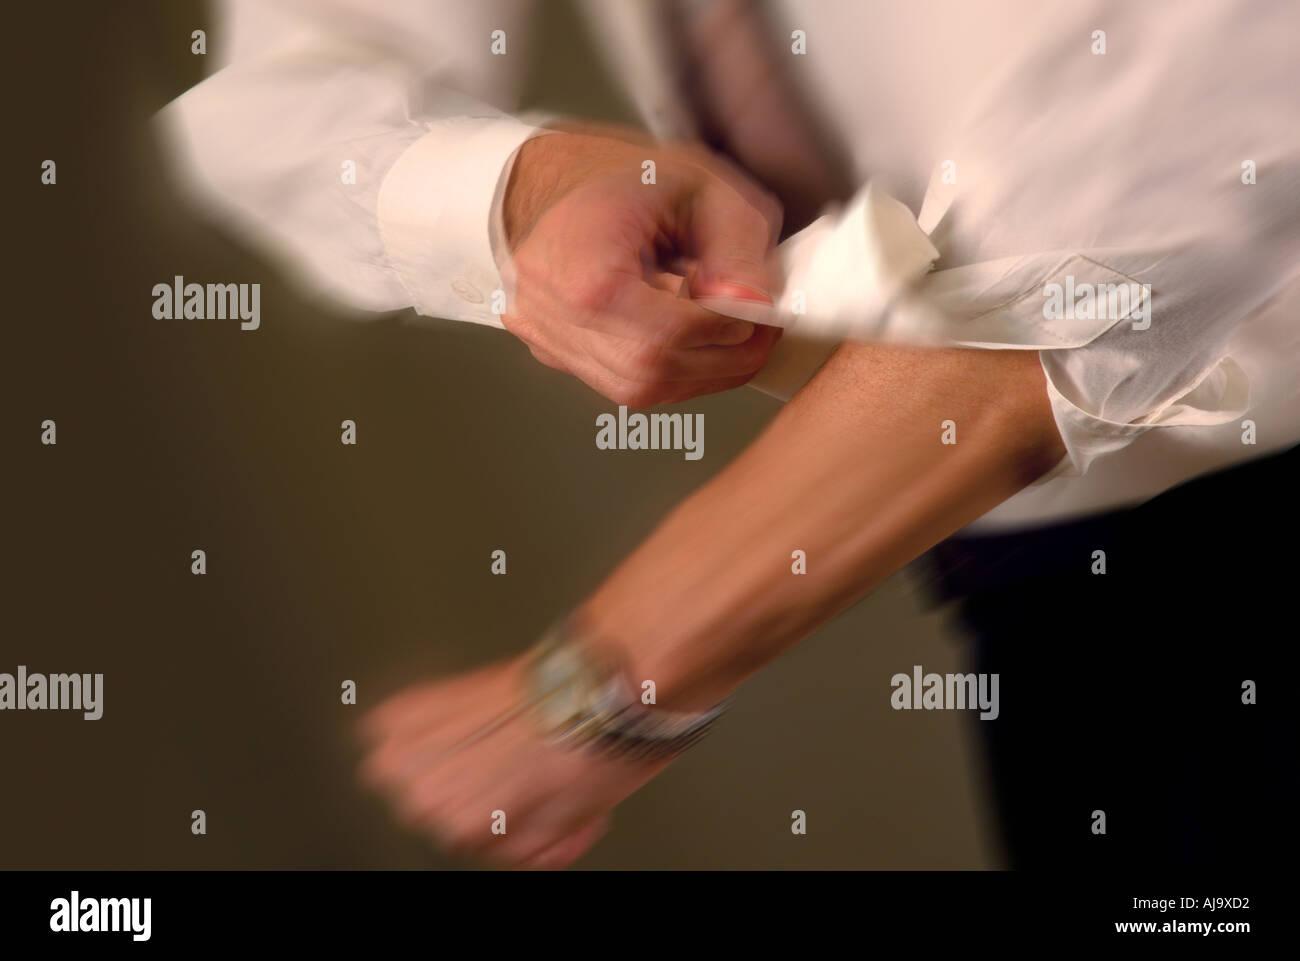 businessman rolling up shirt sleeve - Stock Image